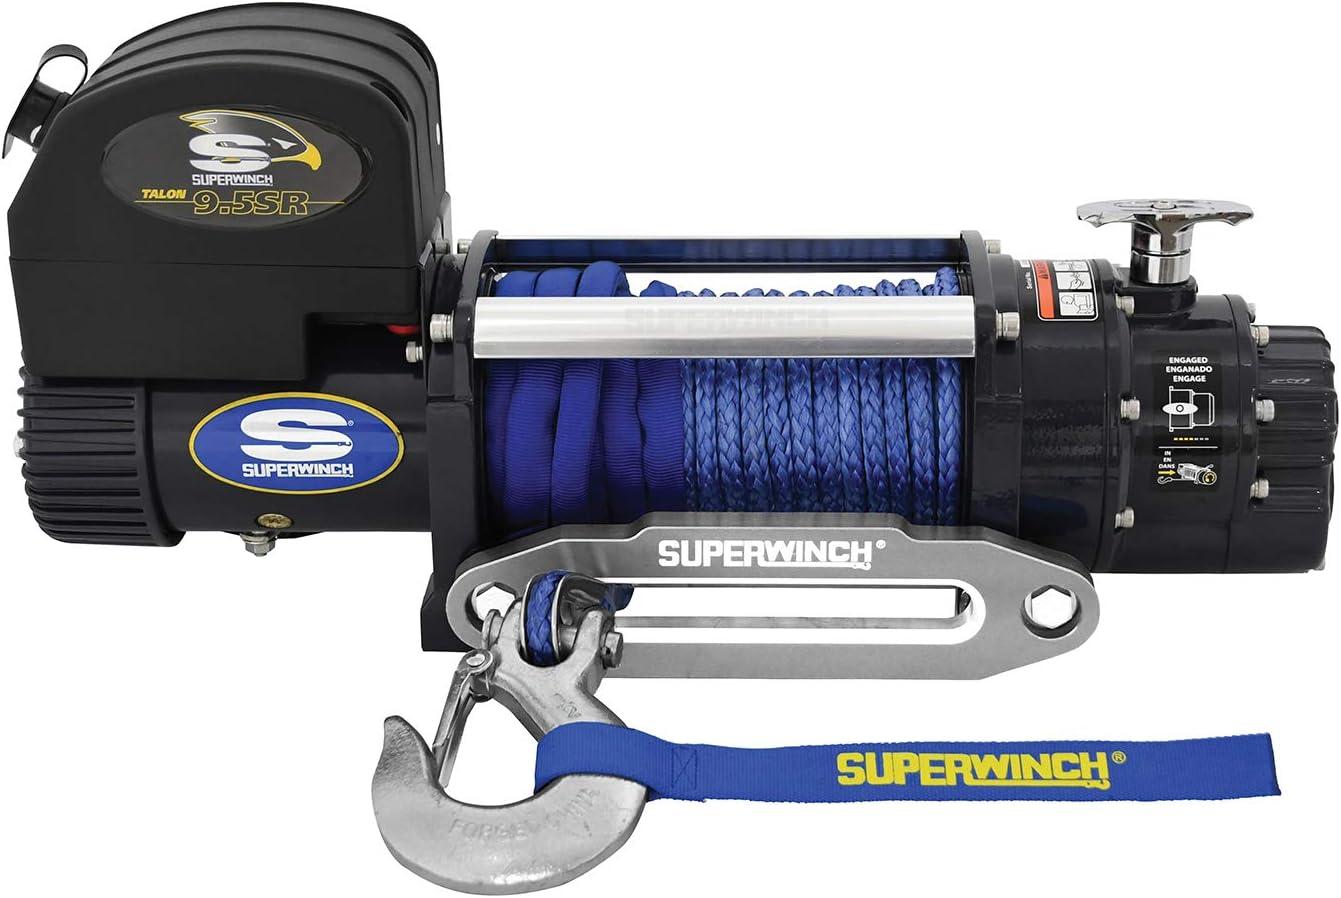 Superwinch 1695201 Talon Memphis Mall 9.5SR 12 VDC Winch Ranking TOP20 9 lb 4 309 500 kg